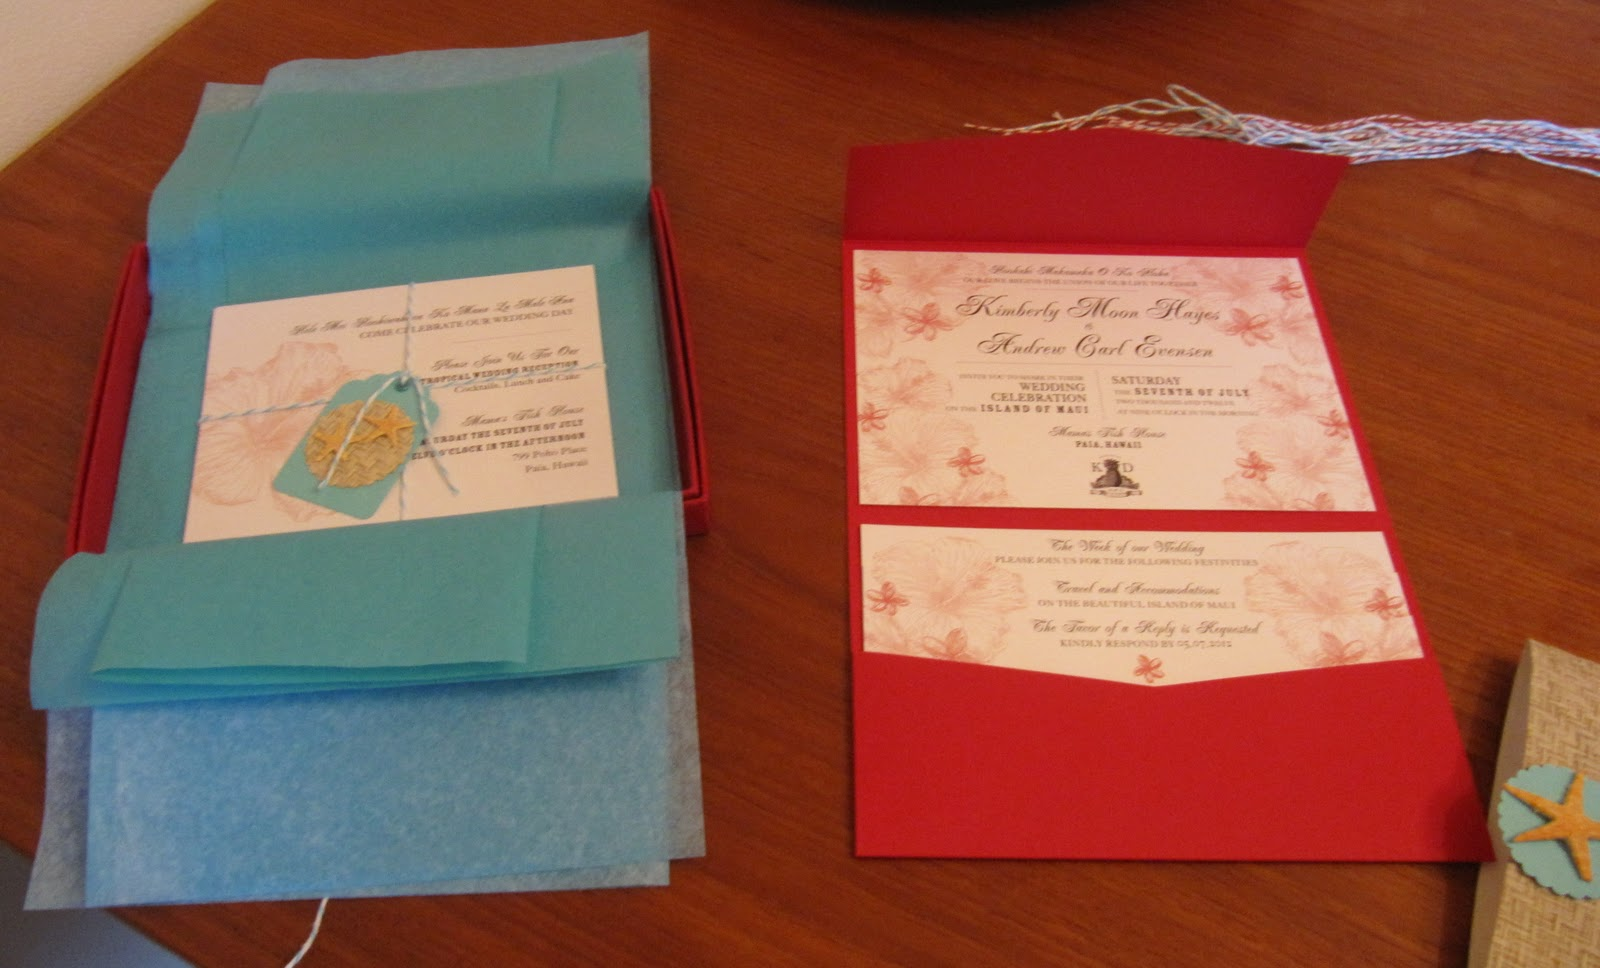 Luxury Wedding Invitation Enclosure Cards Pictures - Invitations and ...